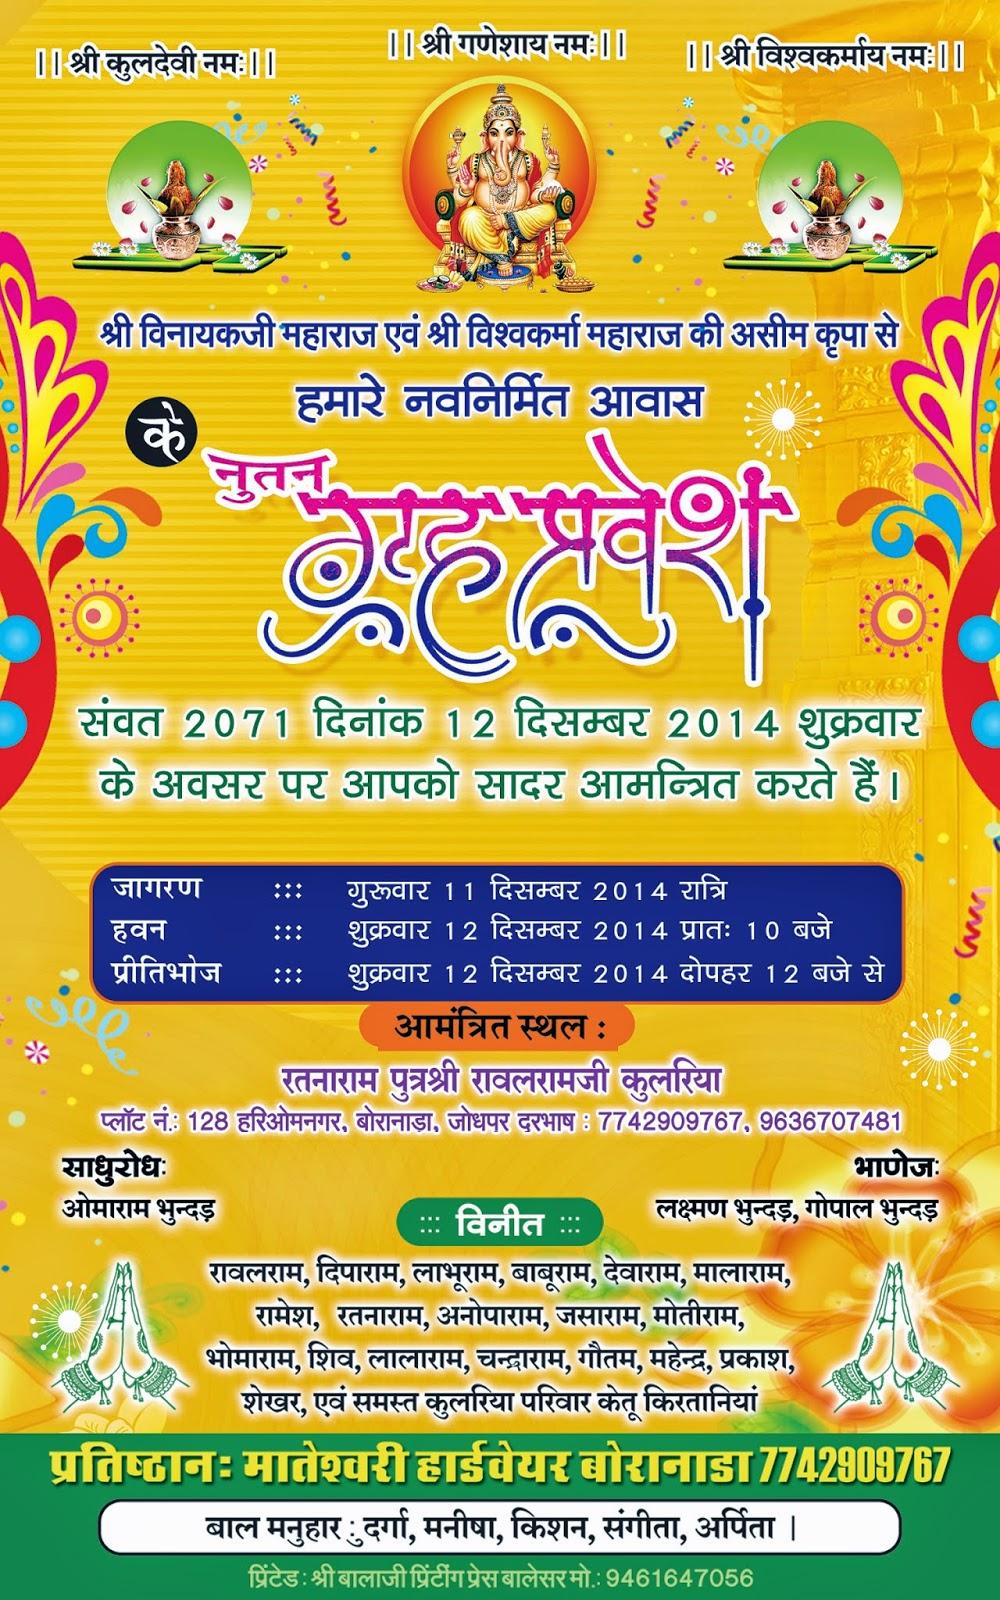 gruha pravesh invitation card design | naveengfx